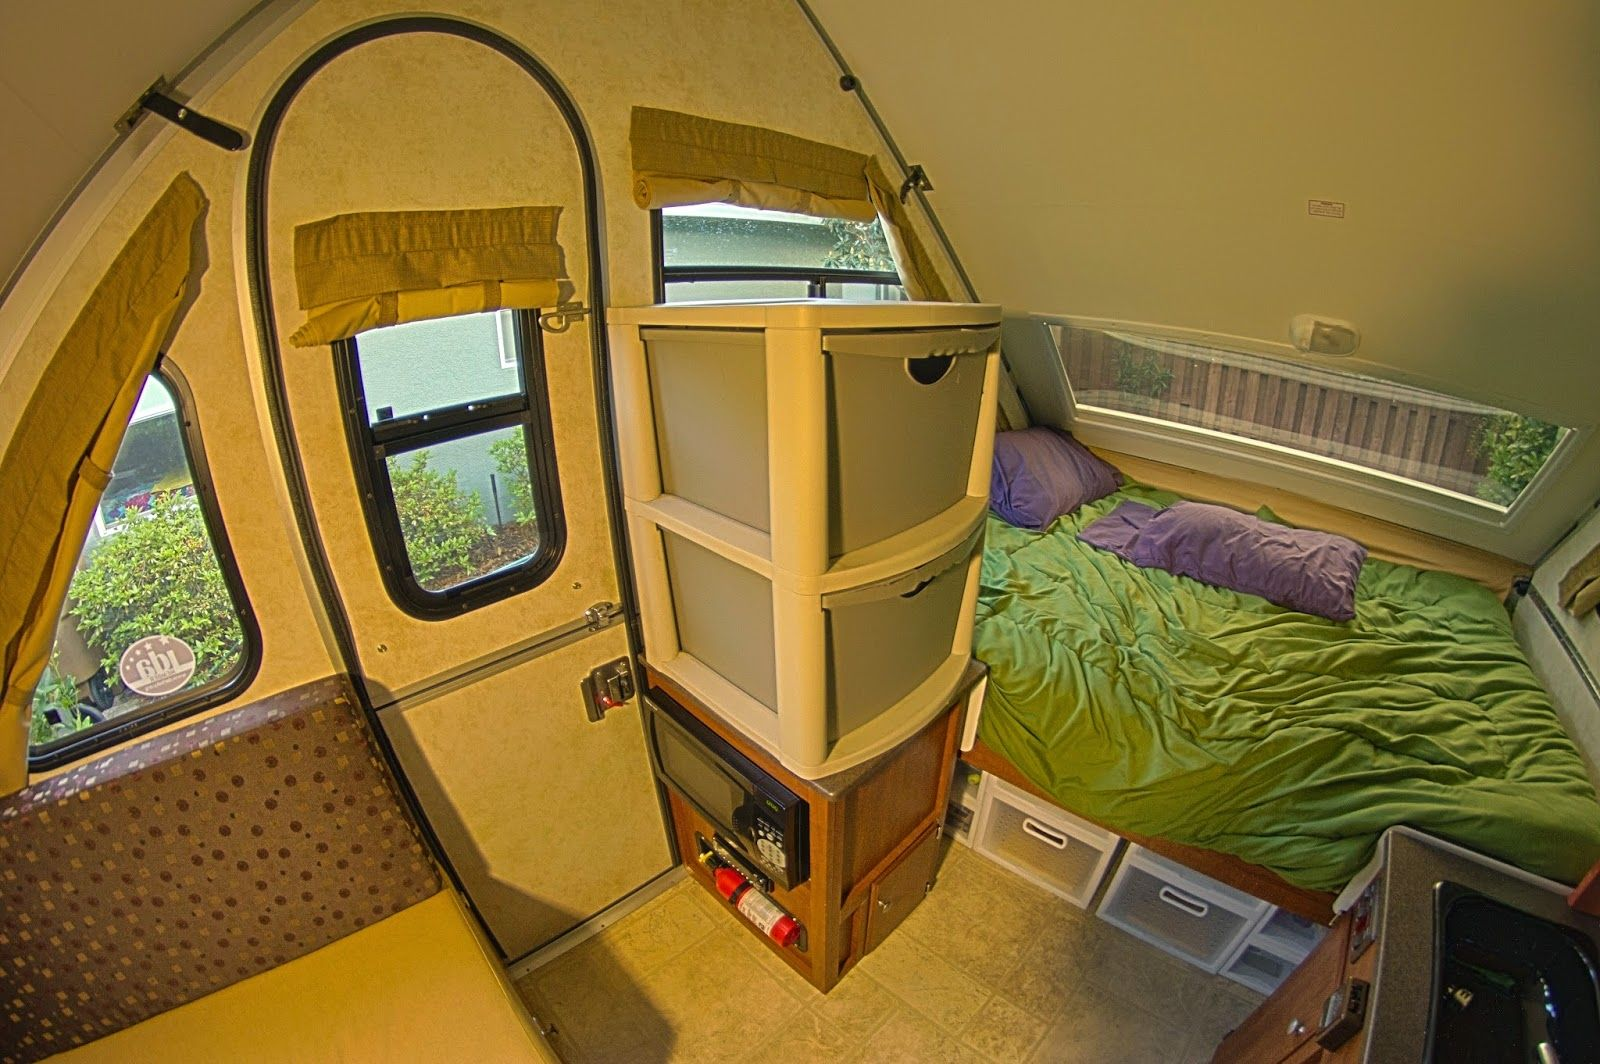 25 Creative Photo Of Aliner Camper Interior Storage Modifications Aliner Camper Interior Storage Modifications Coates Astrophotog Travel And Camper Aline